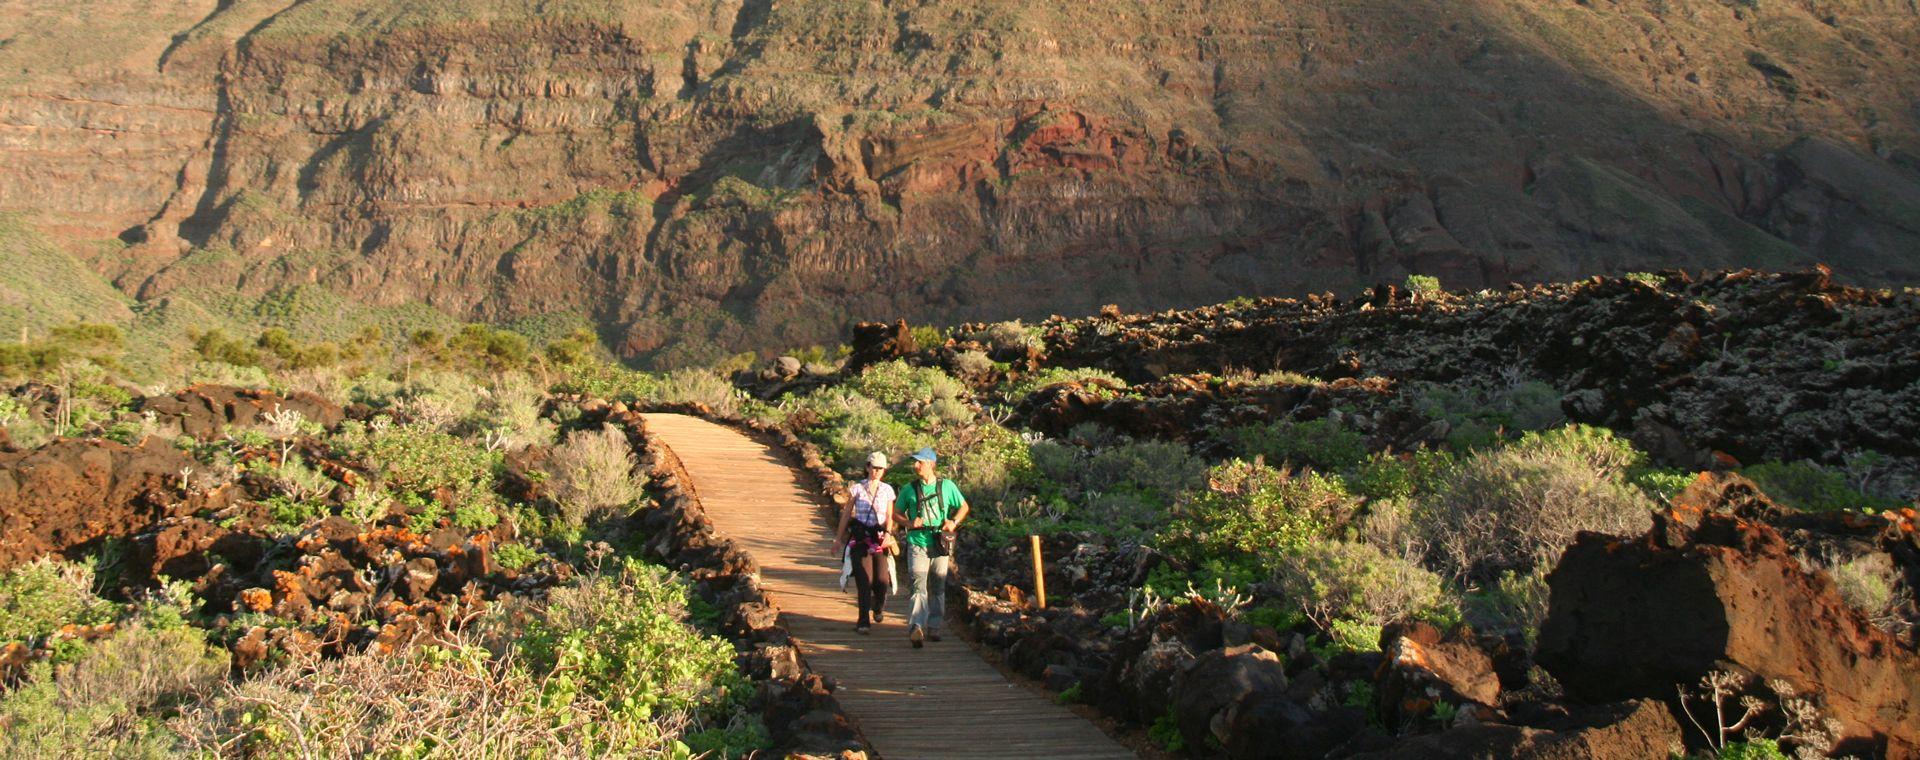 Image Canaries : l'île sauvage d'El Hierro